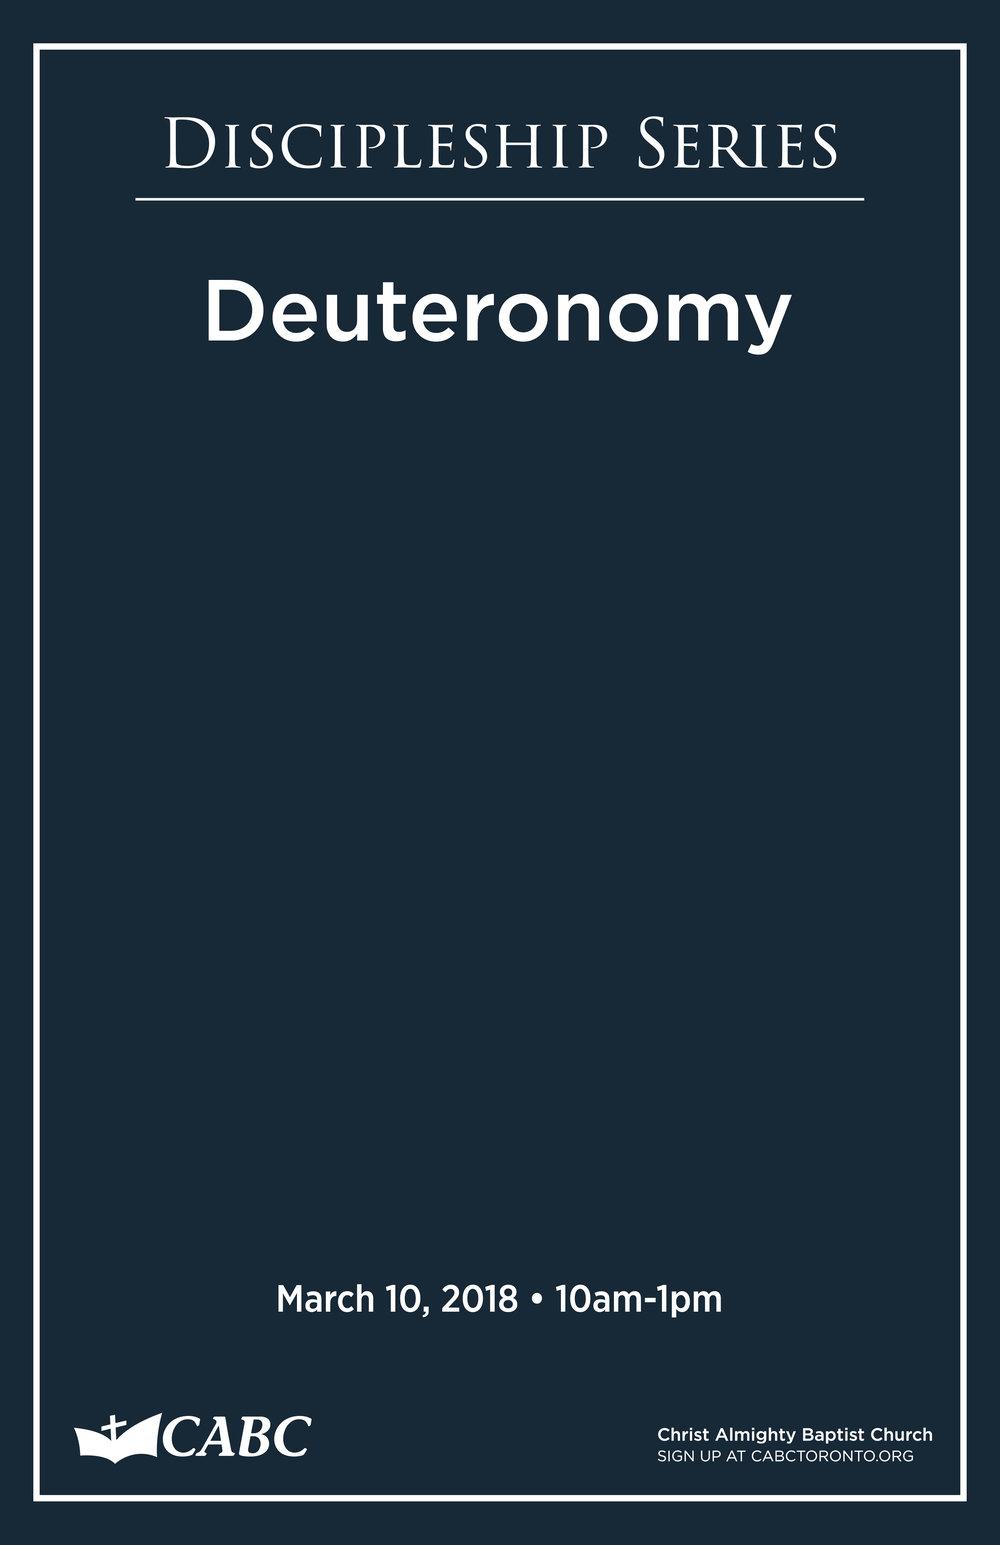 CABC-DiscipleshipSeries2018-Deuteronomy-Poster.jpg